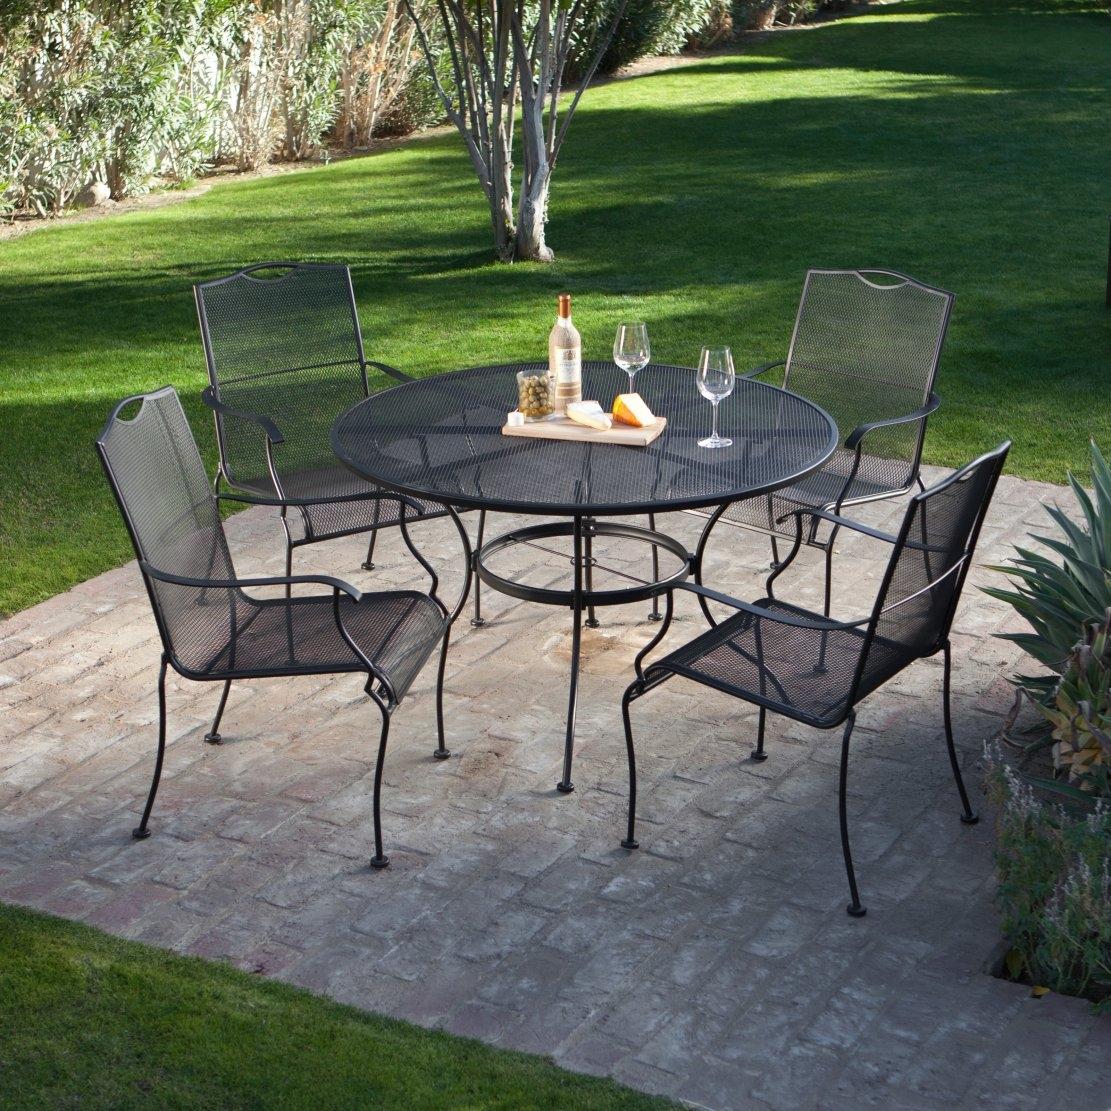 5-piece wrought iron patio furniture